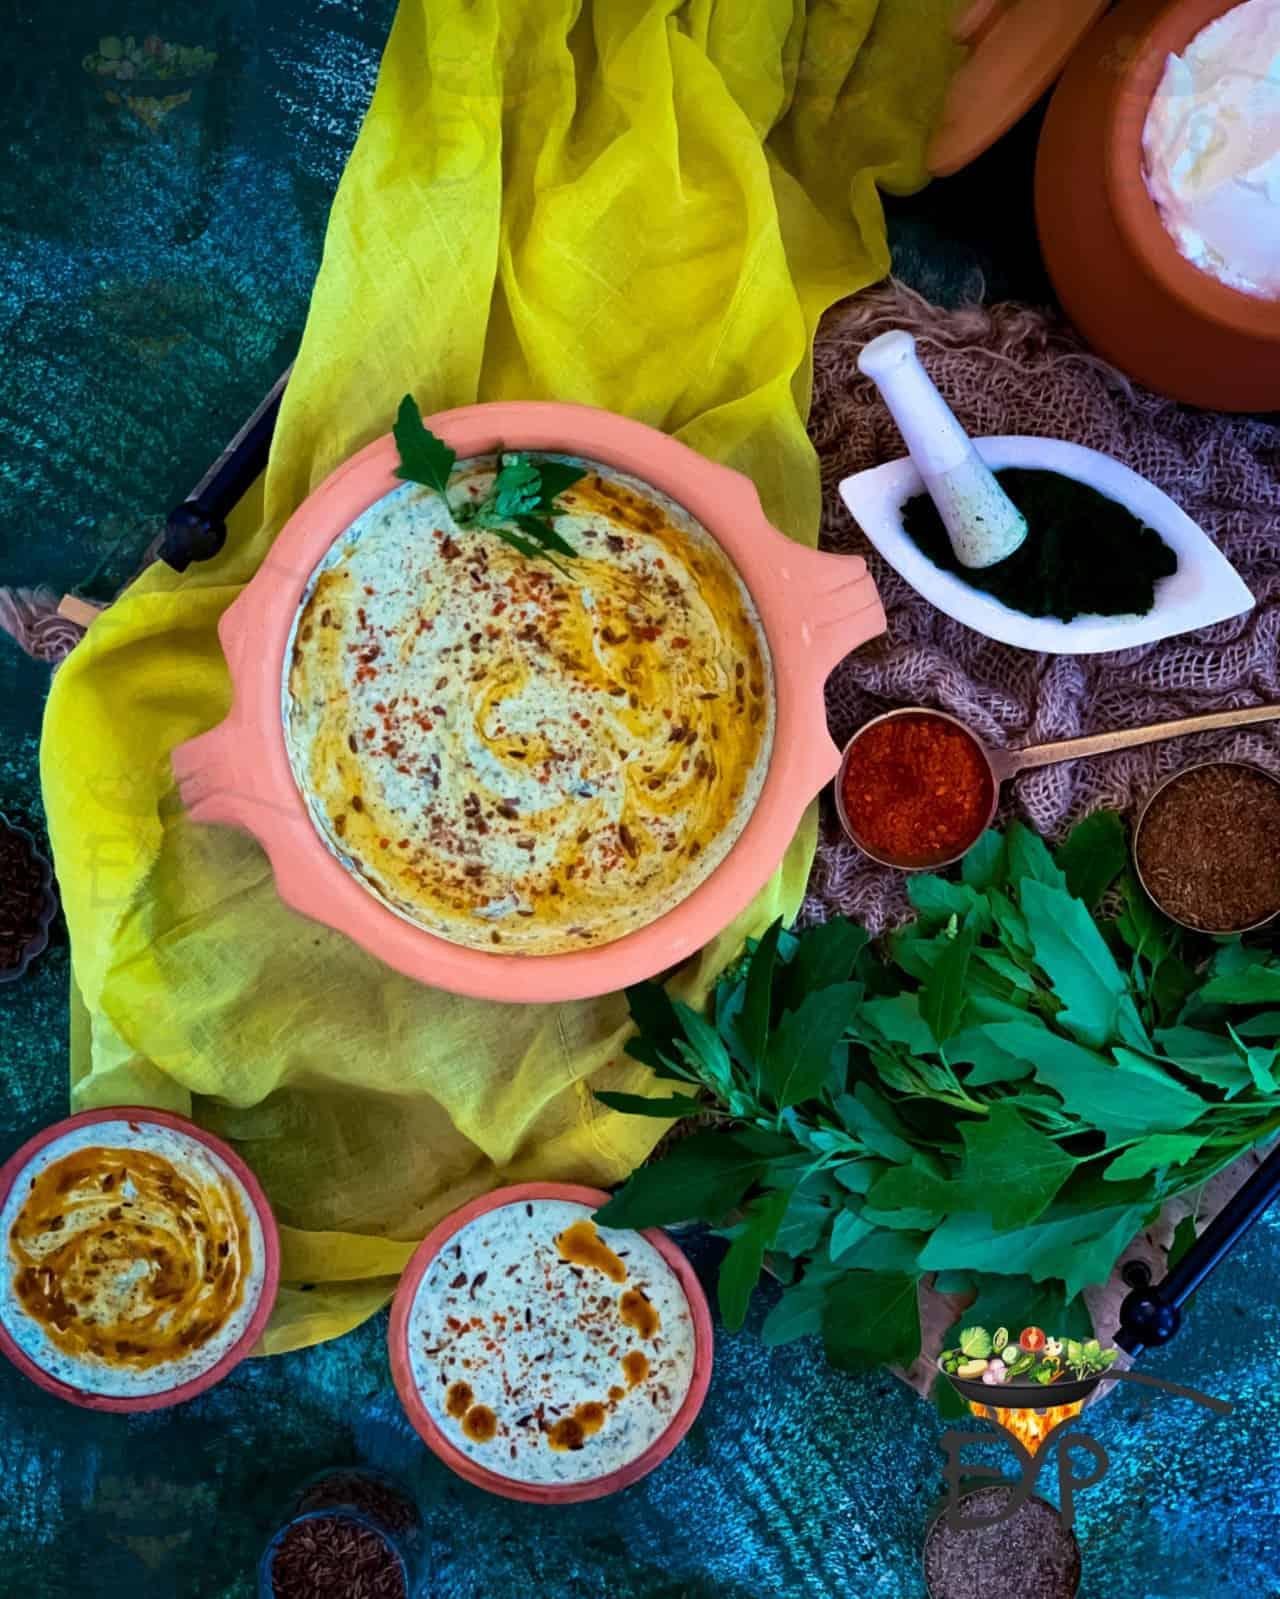 Bathua Ka Raita served in an artisan clay bowl; shown with spices